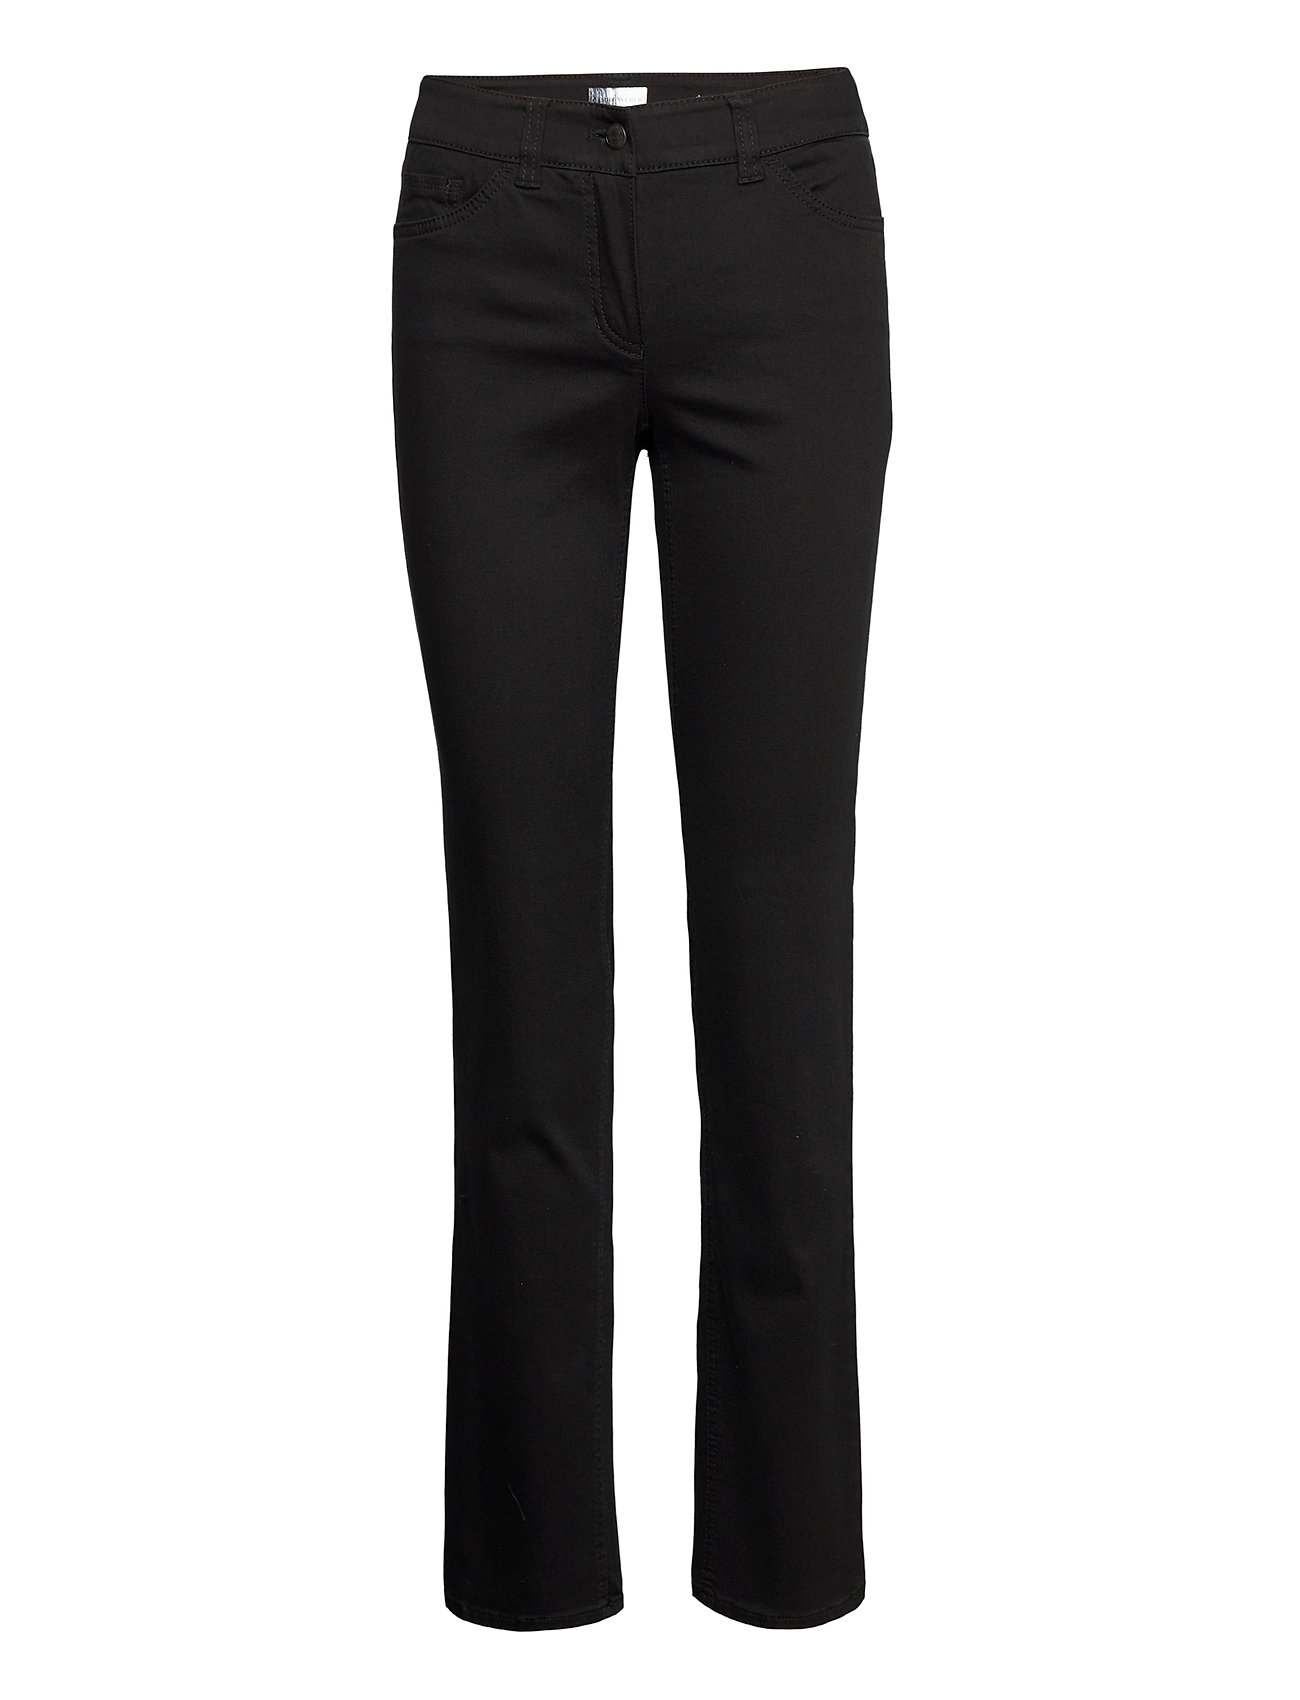 Jeans Long Slim Jeans Sort Gerry Weber Edition